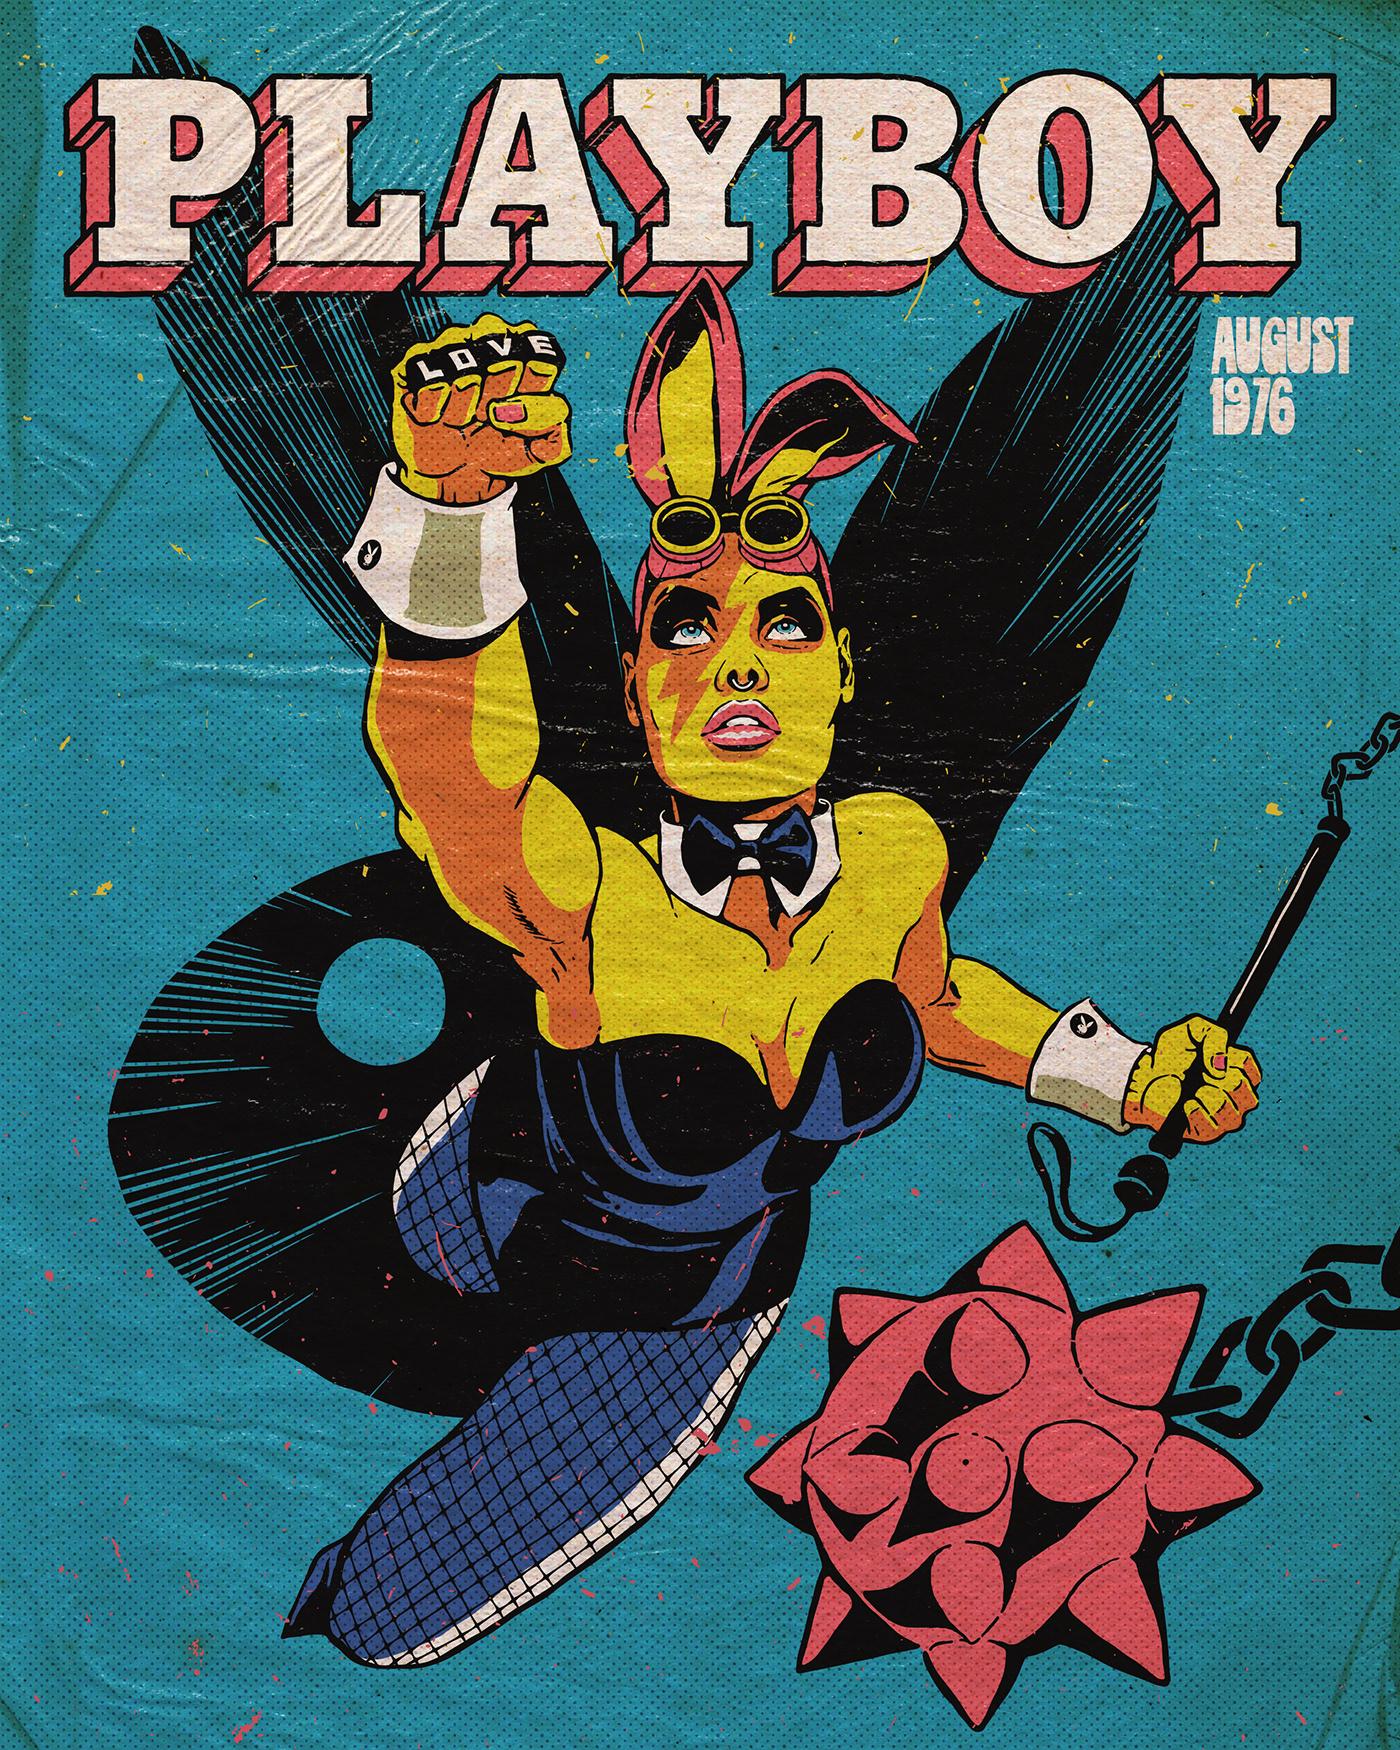 bunnies bunny magazine playboy pop culture